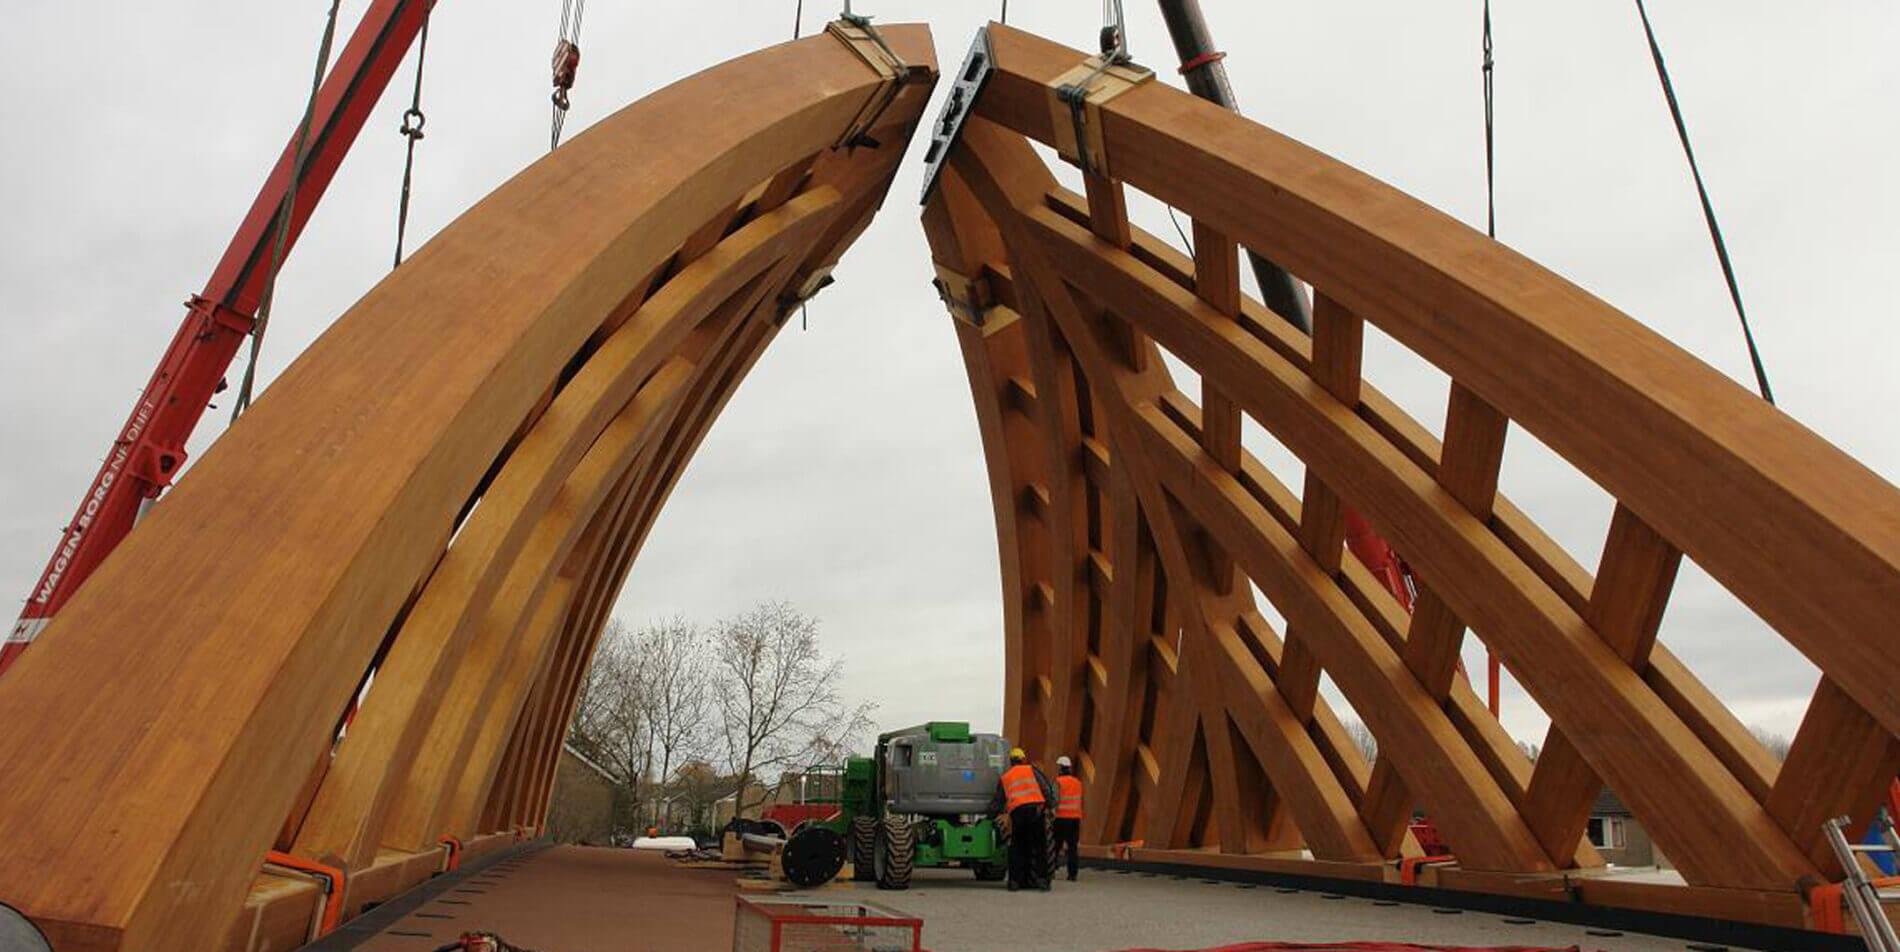 Quelle: Accoya |Accoya Sneek Bridge Netherlands